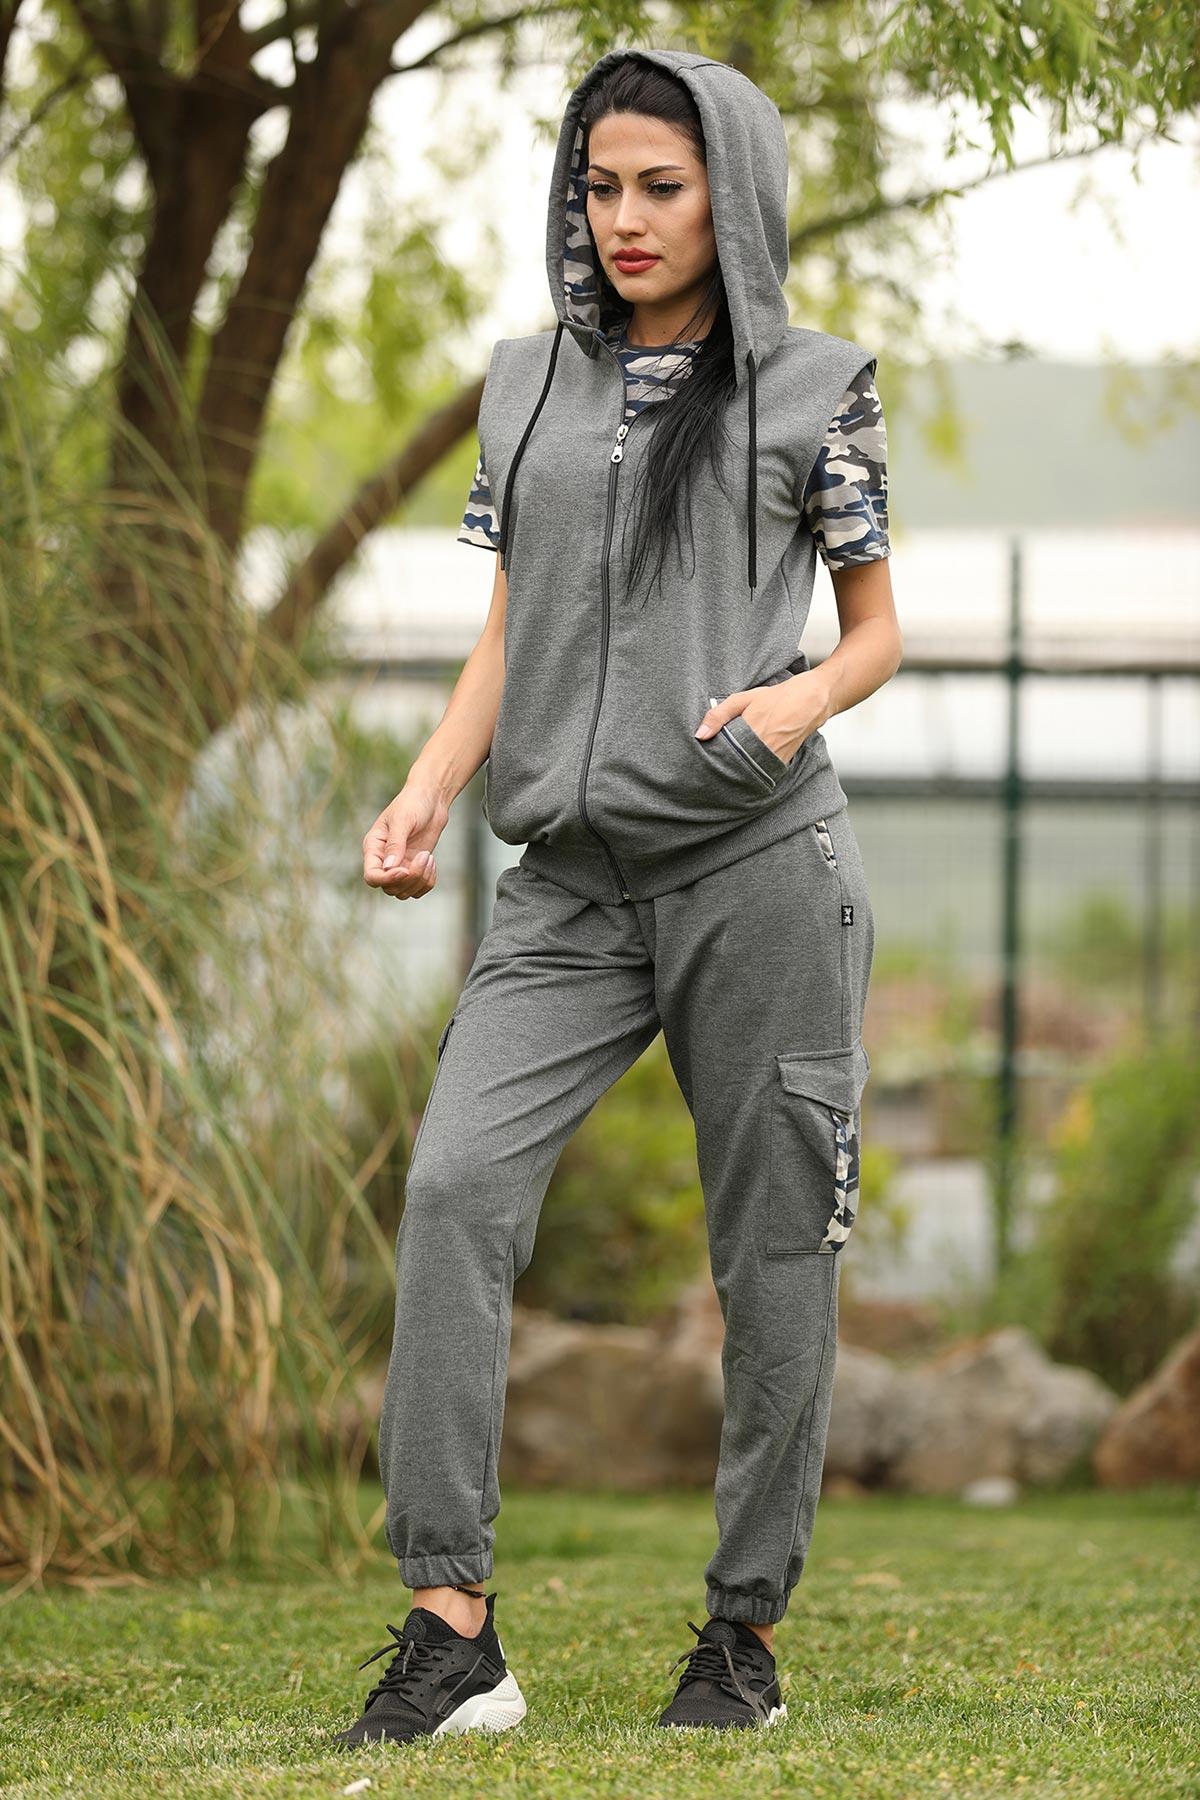 Women's Camouflage Pattern Dark Grey Sweat Suit